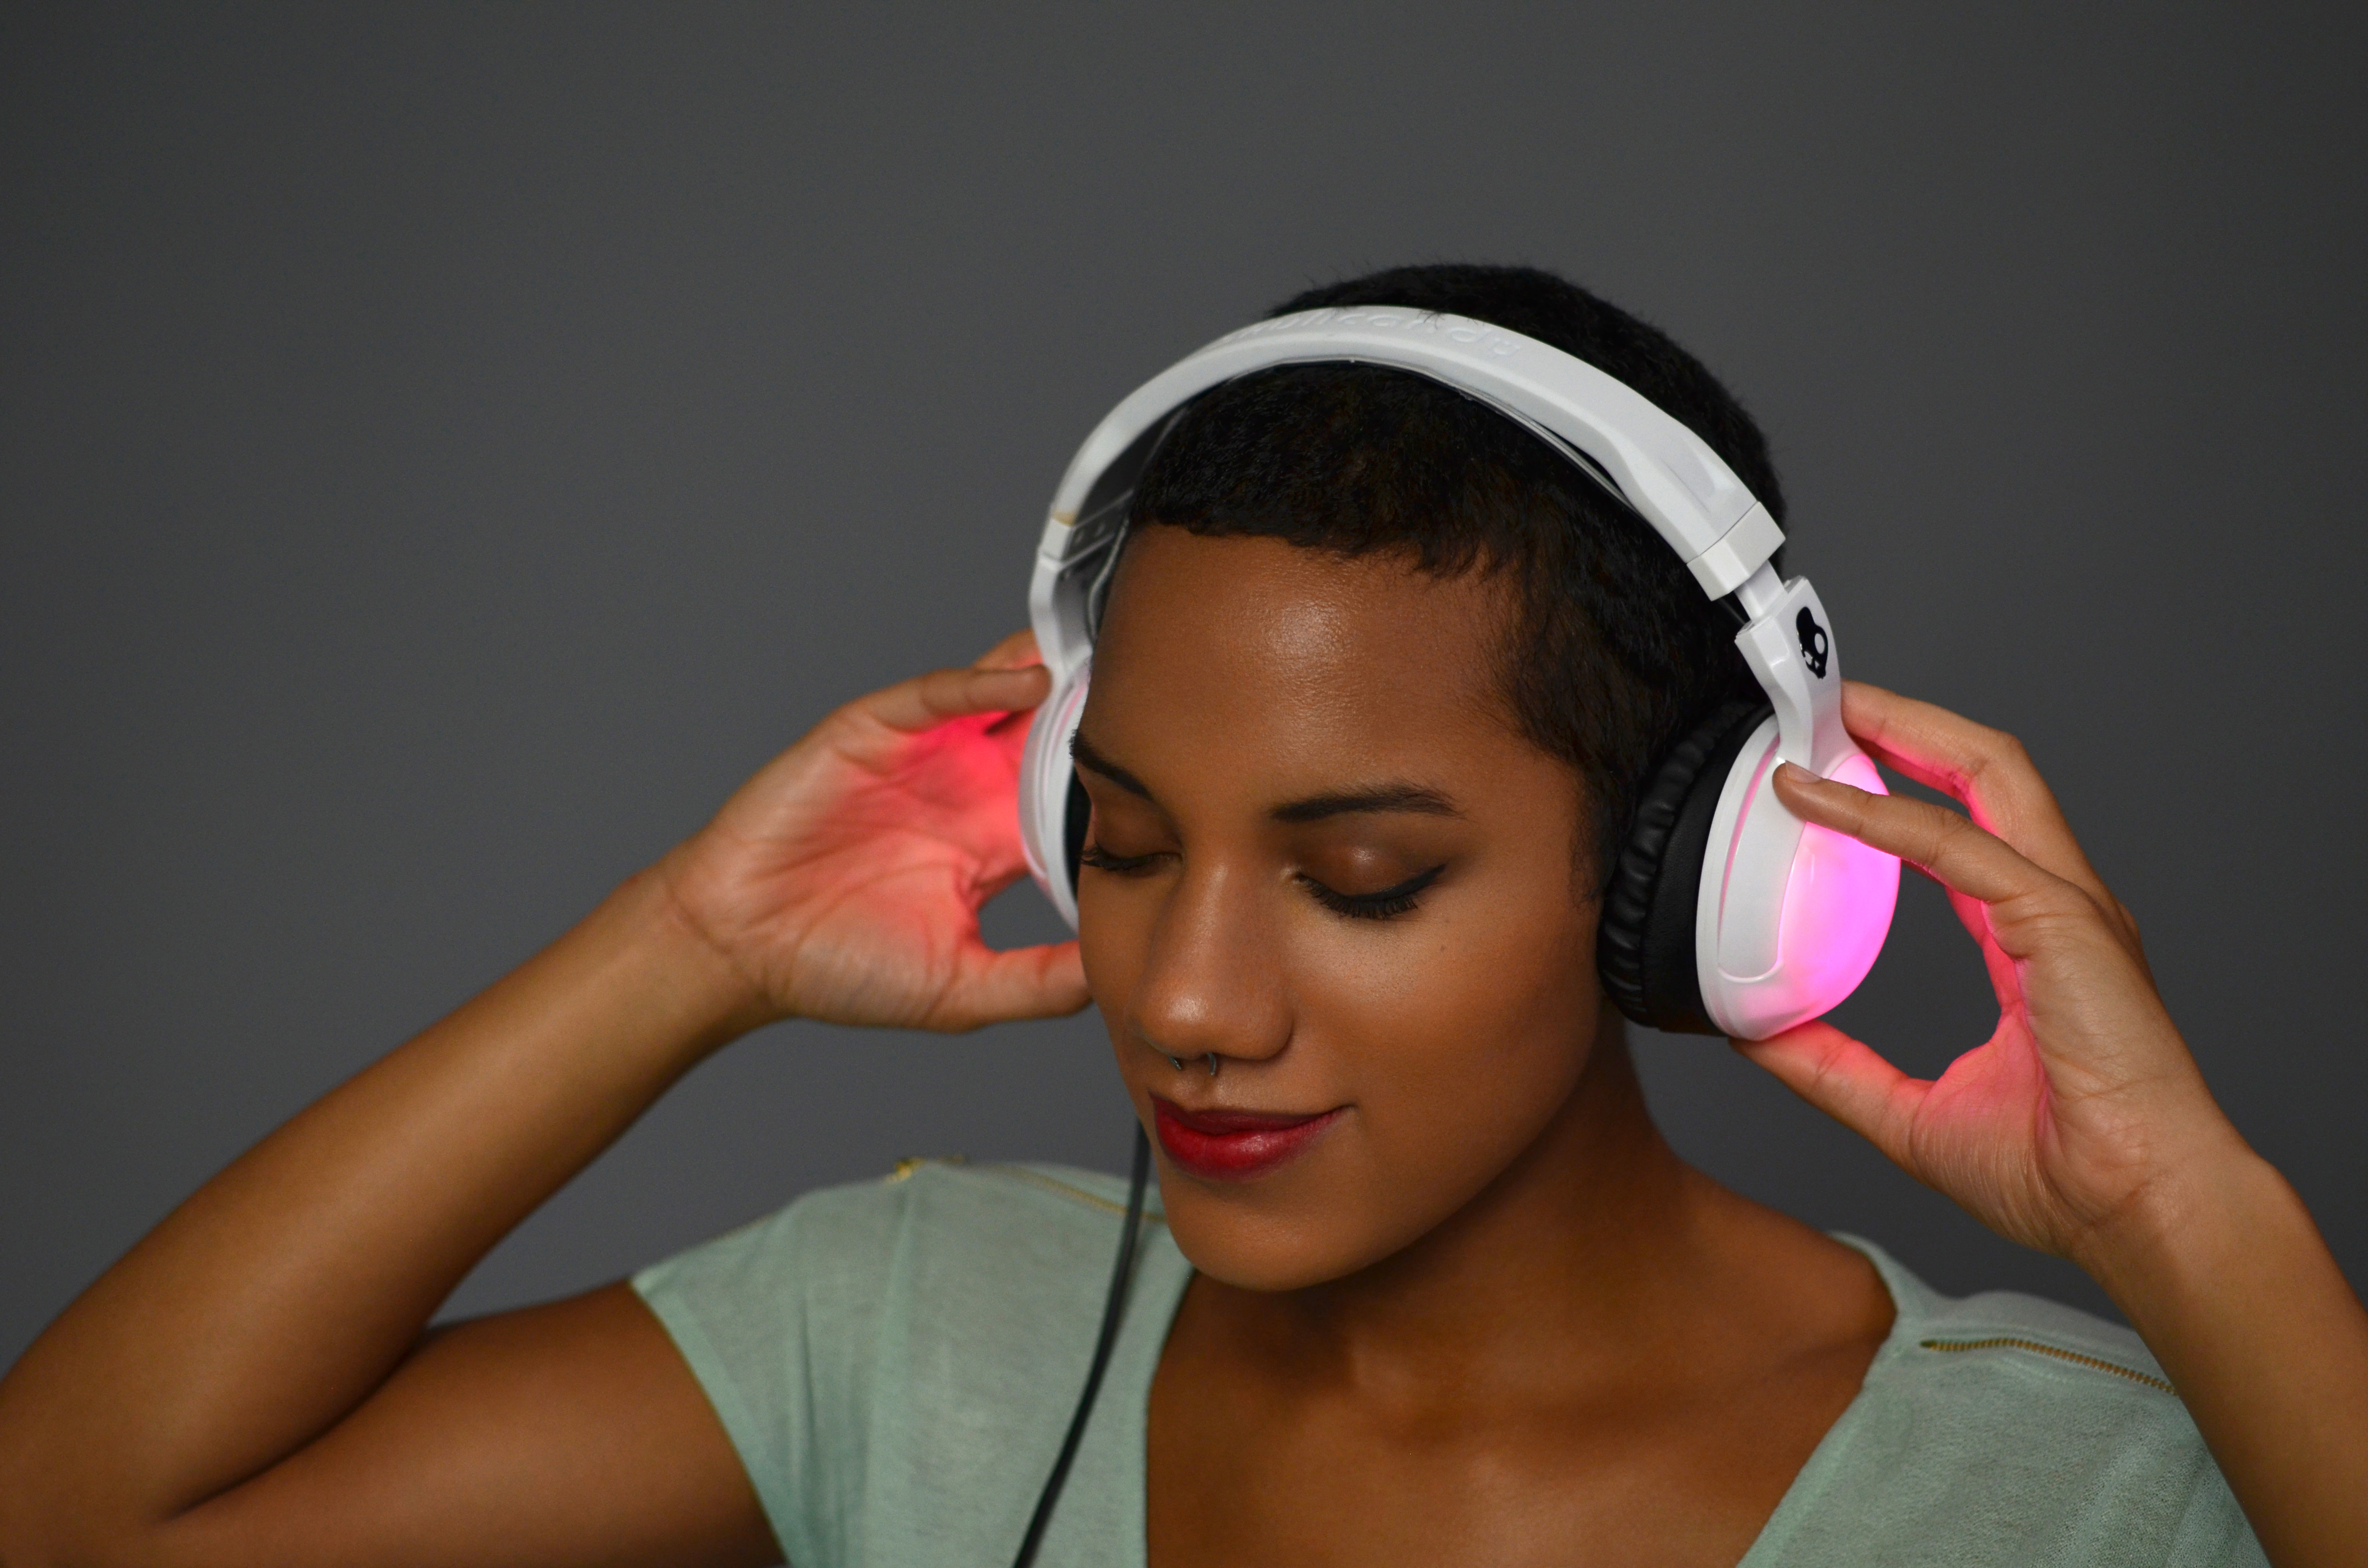 flora_RisaRose_Skullcandy_LED_Headphones_Rockingout.jpg